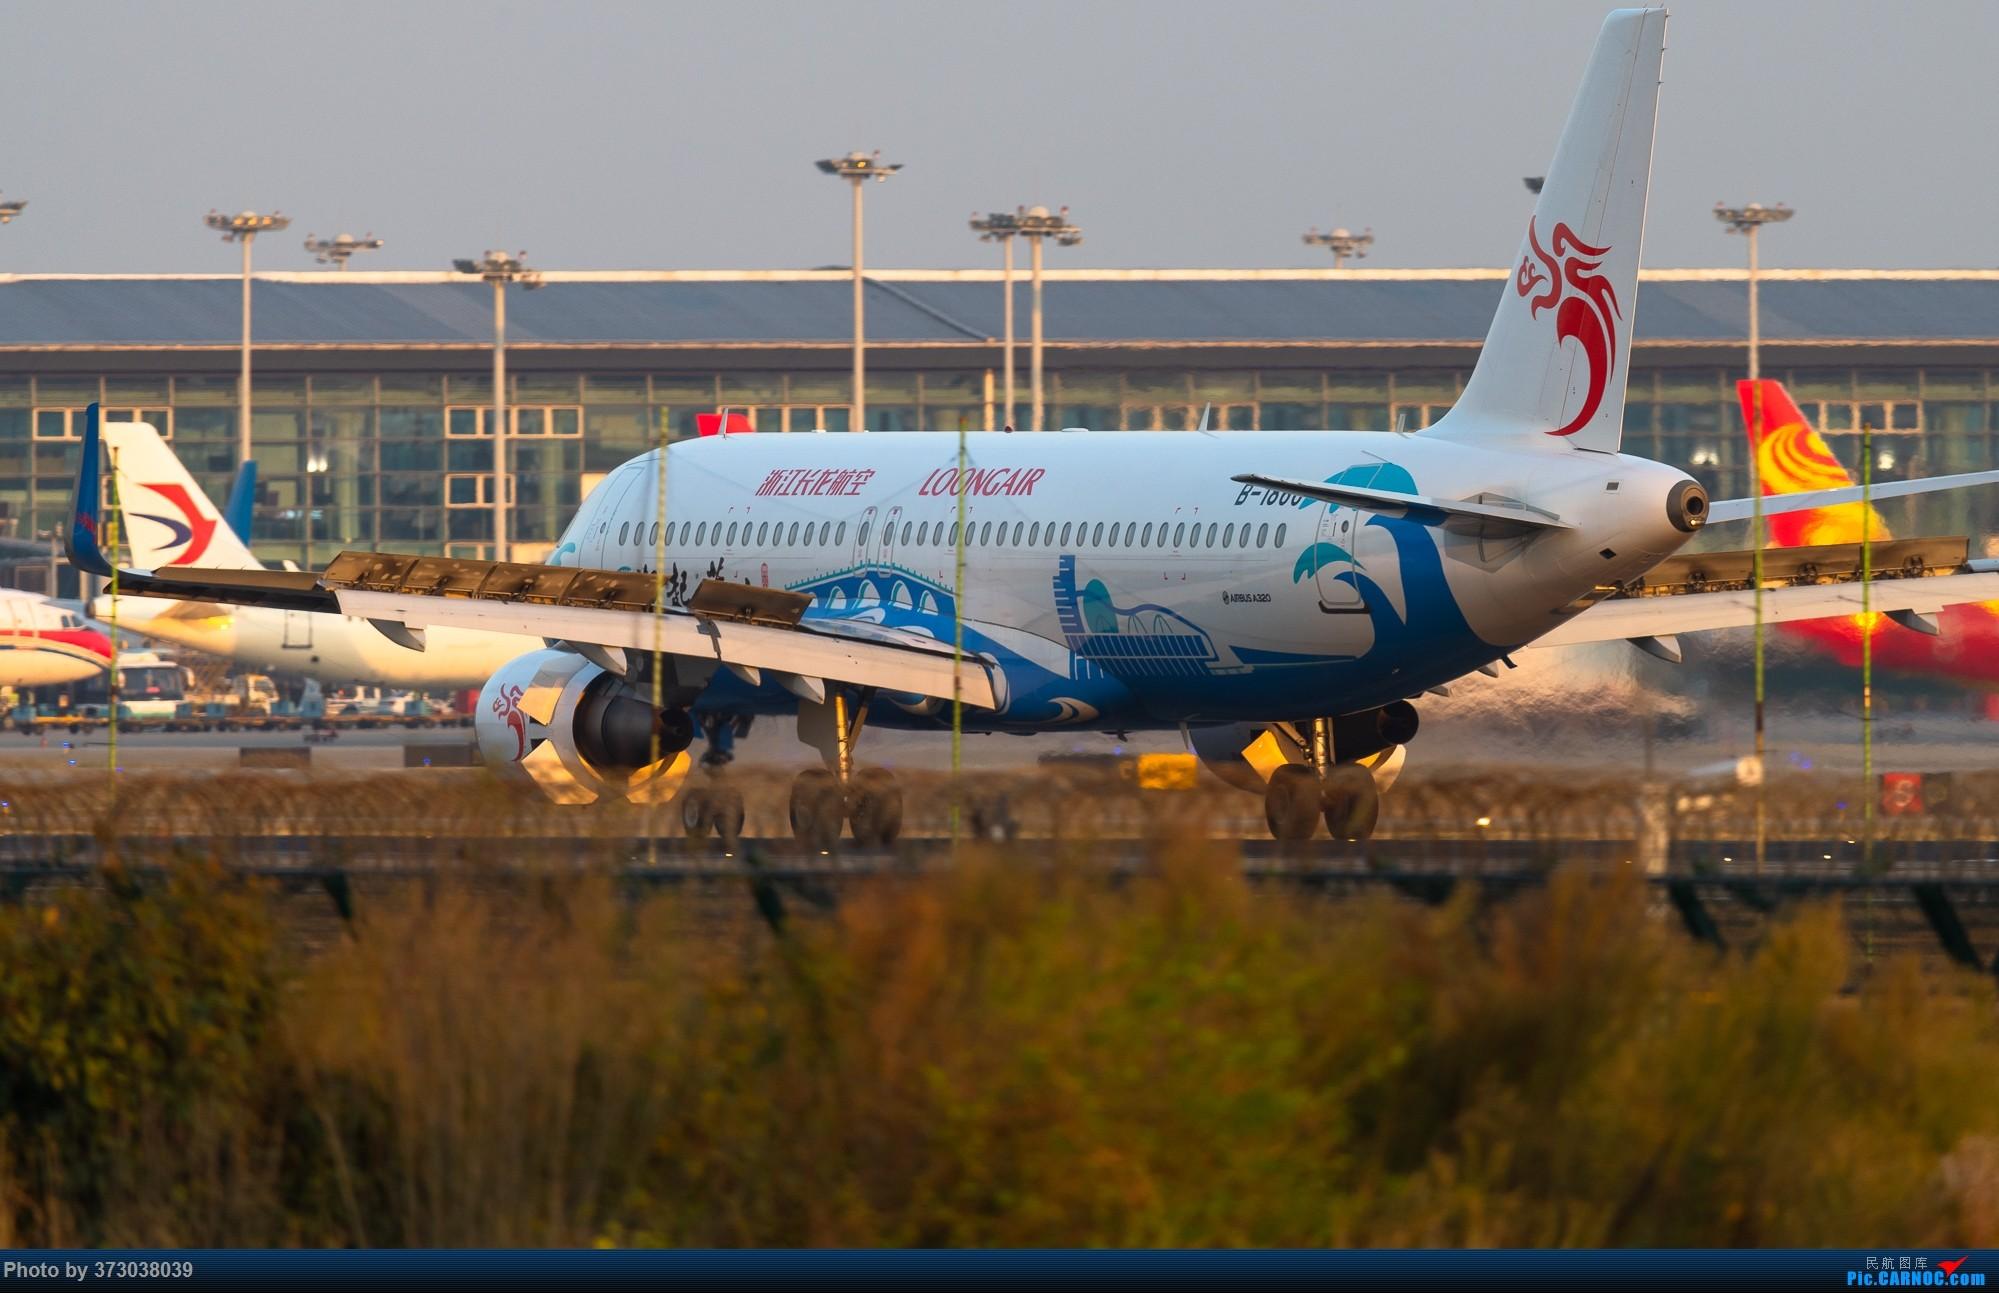 Re:[原创]浙江长龙航空 潮起萧山号彩绘日暮回归 AIRBUS A320-200 B-1866 中国杭州萧山国际机场 中国杭州萧山国际机场